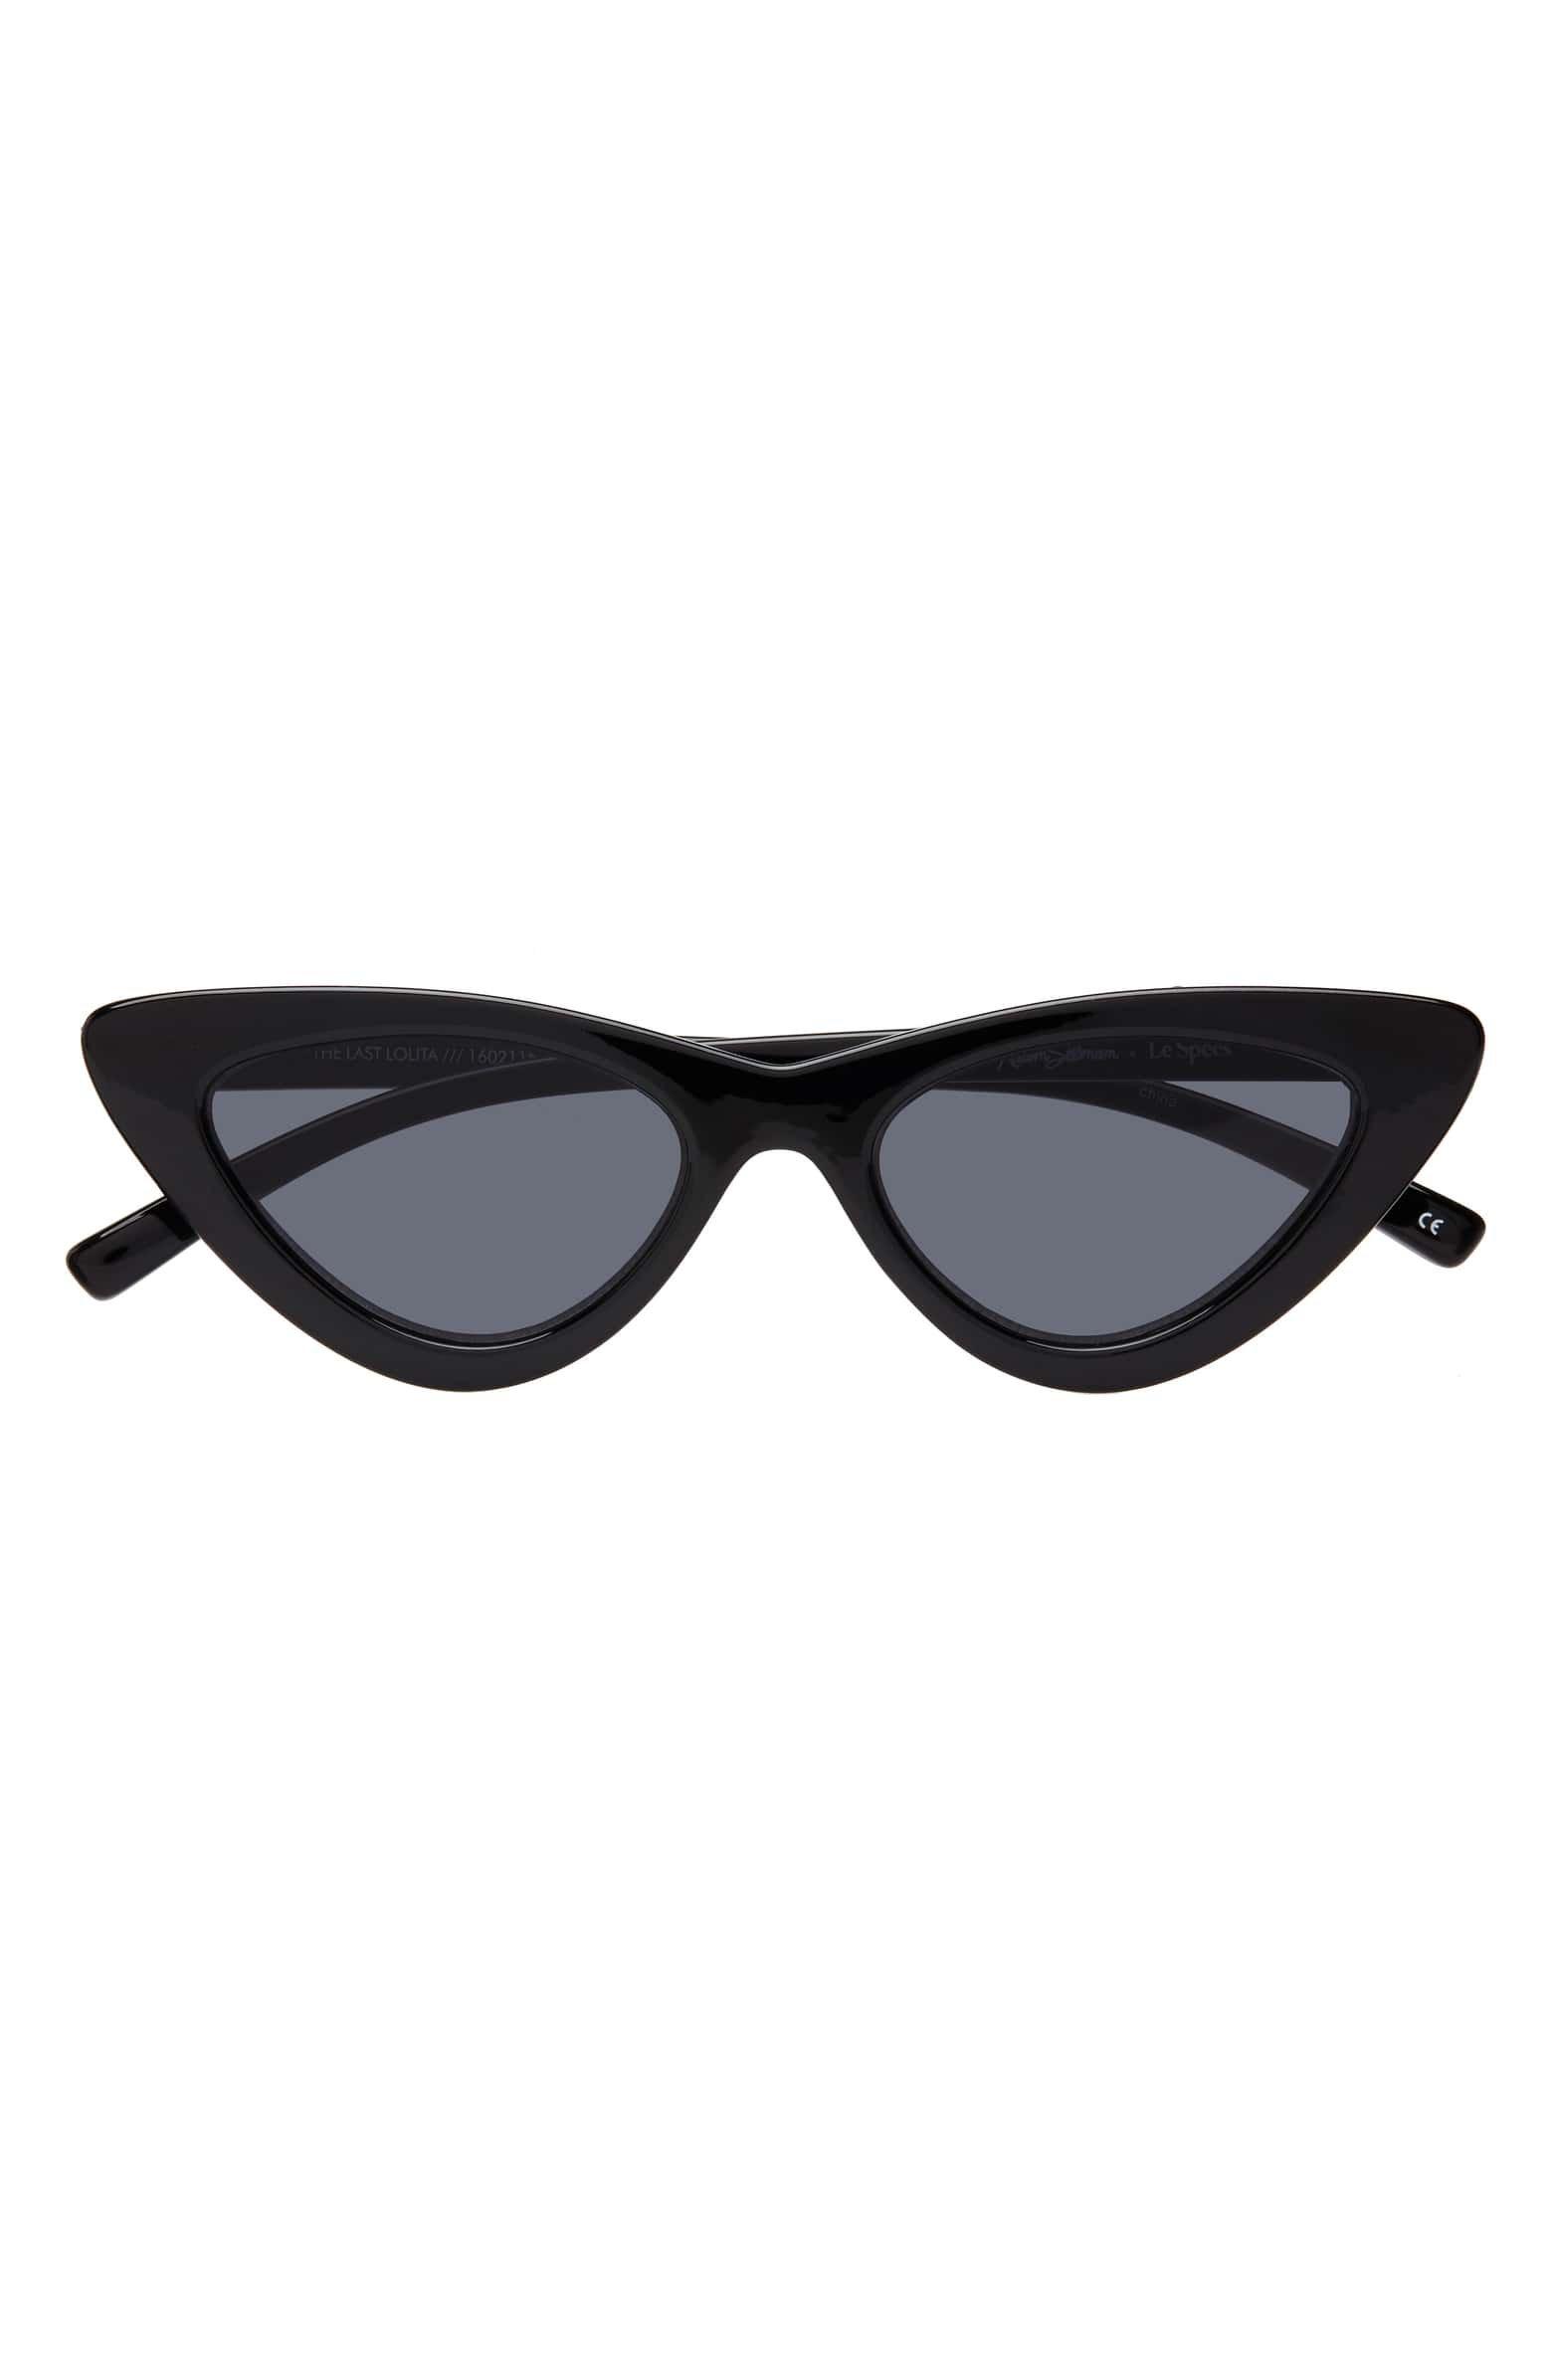 Adam Selman x Le Specs Luxe Lolita 49mm Cat Eye Sunglasses | Nordstrom